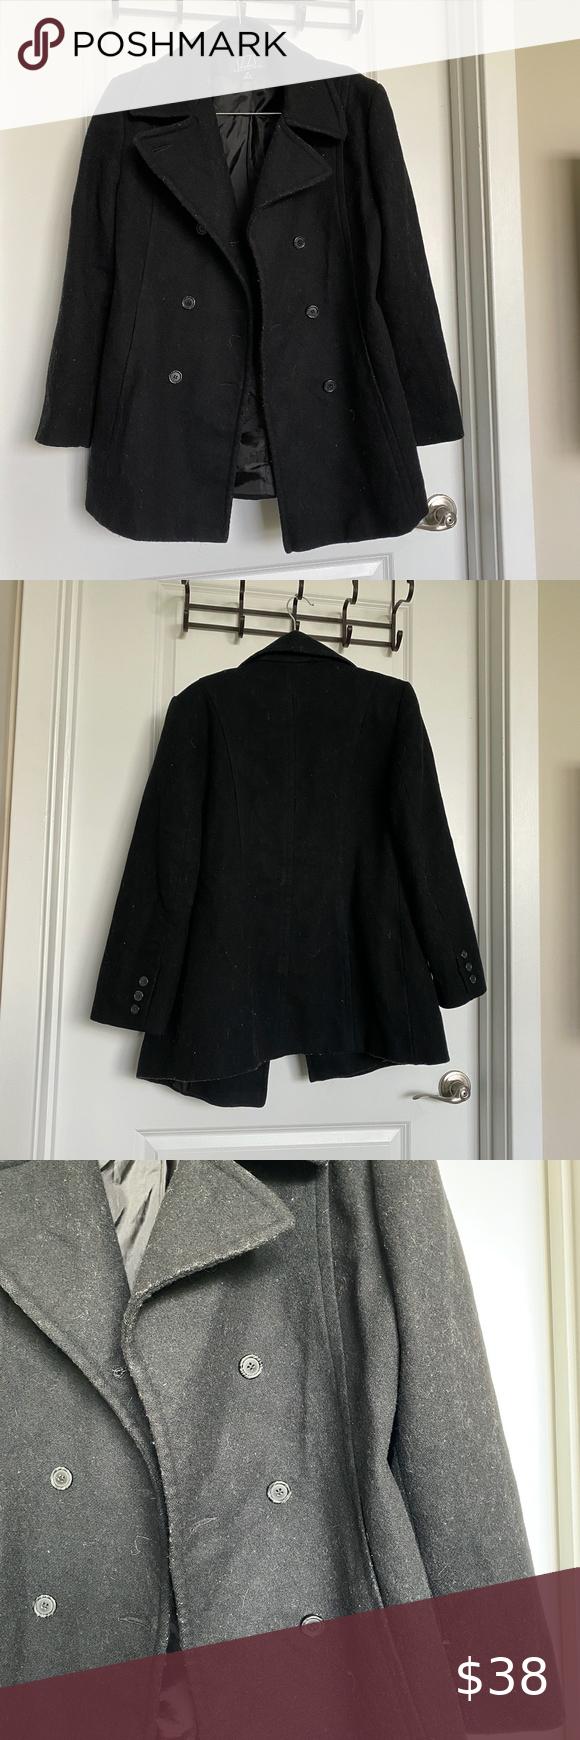 Black Izzi Wool Coat Wool Coat Coat Colorful Coat [ 1740 x 580 Pixel ]